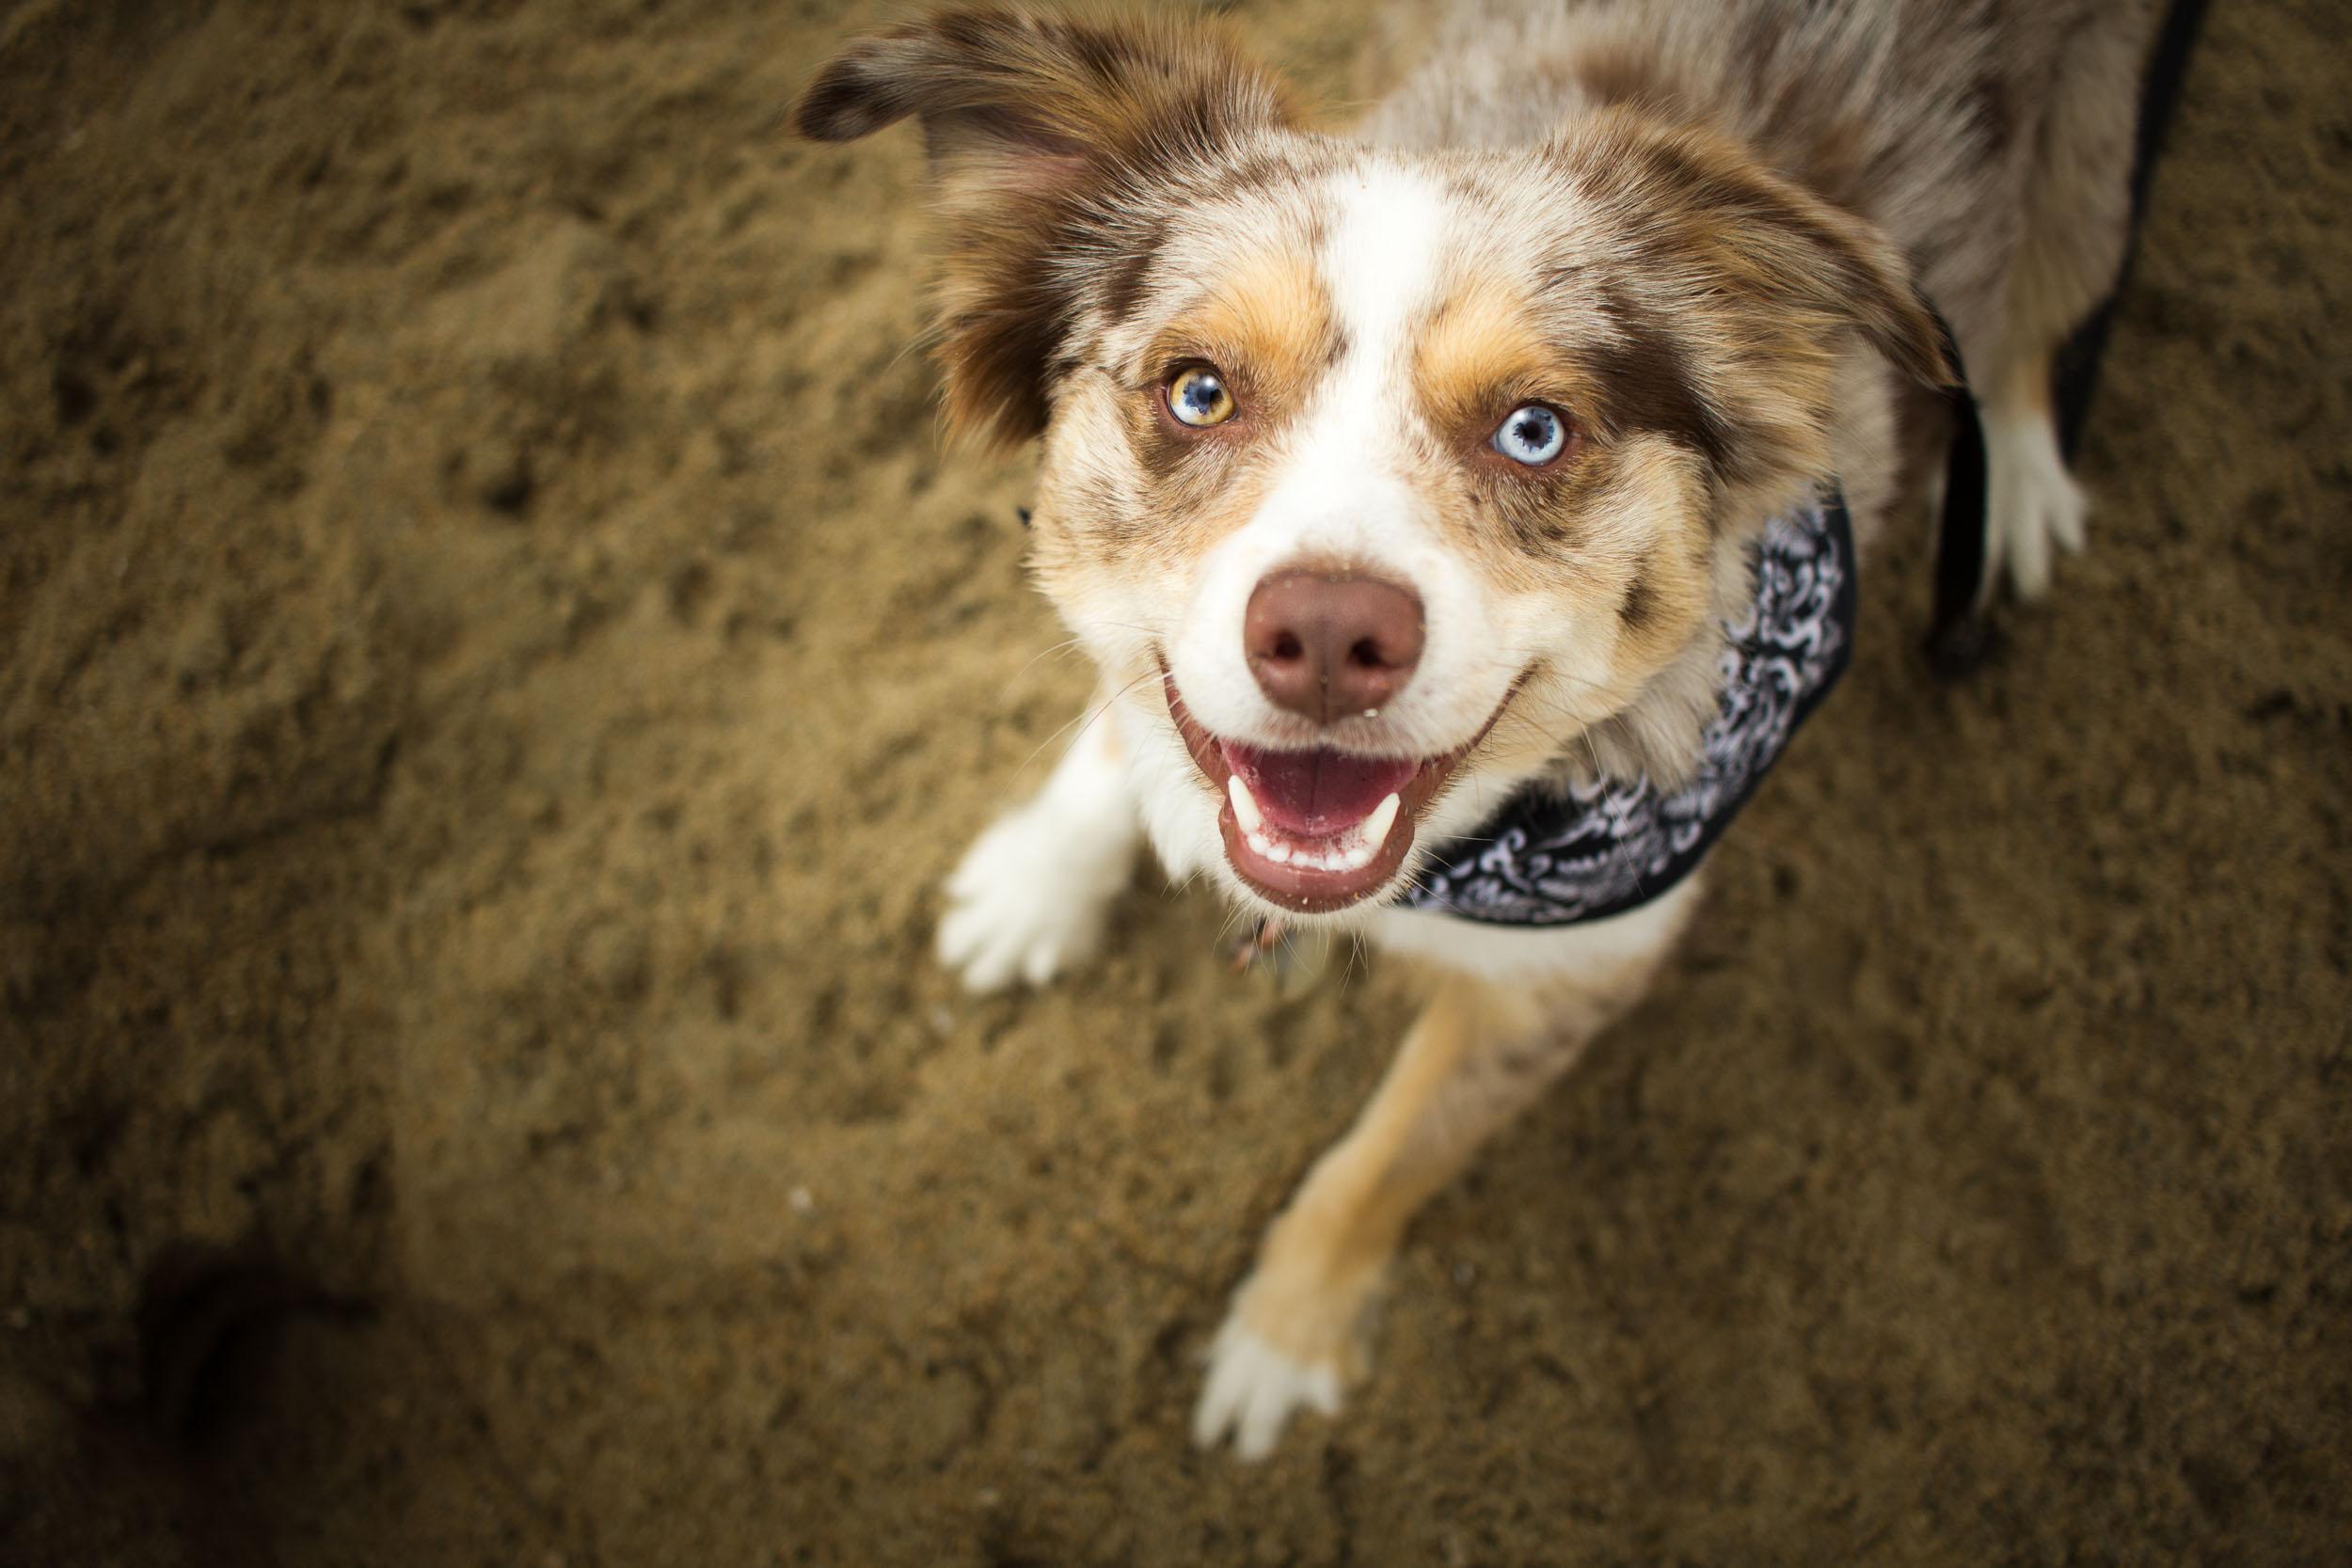 09-Orange-County-Dog-Photographer-Southern-California-Steamer-Lee.JPG